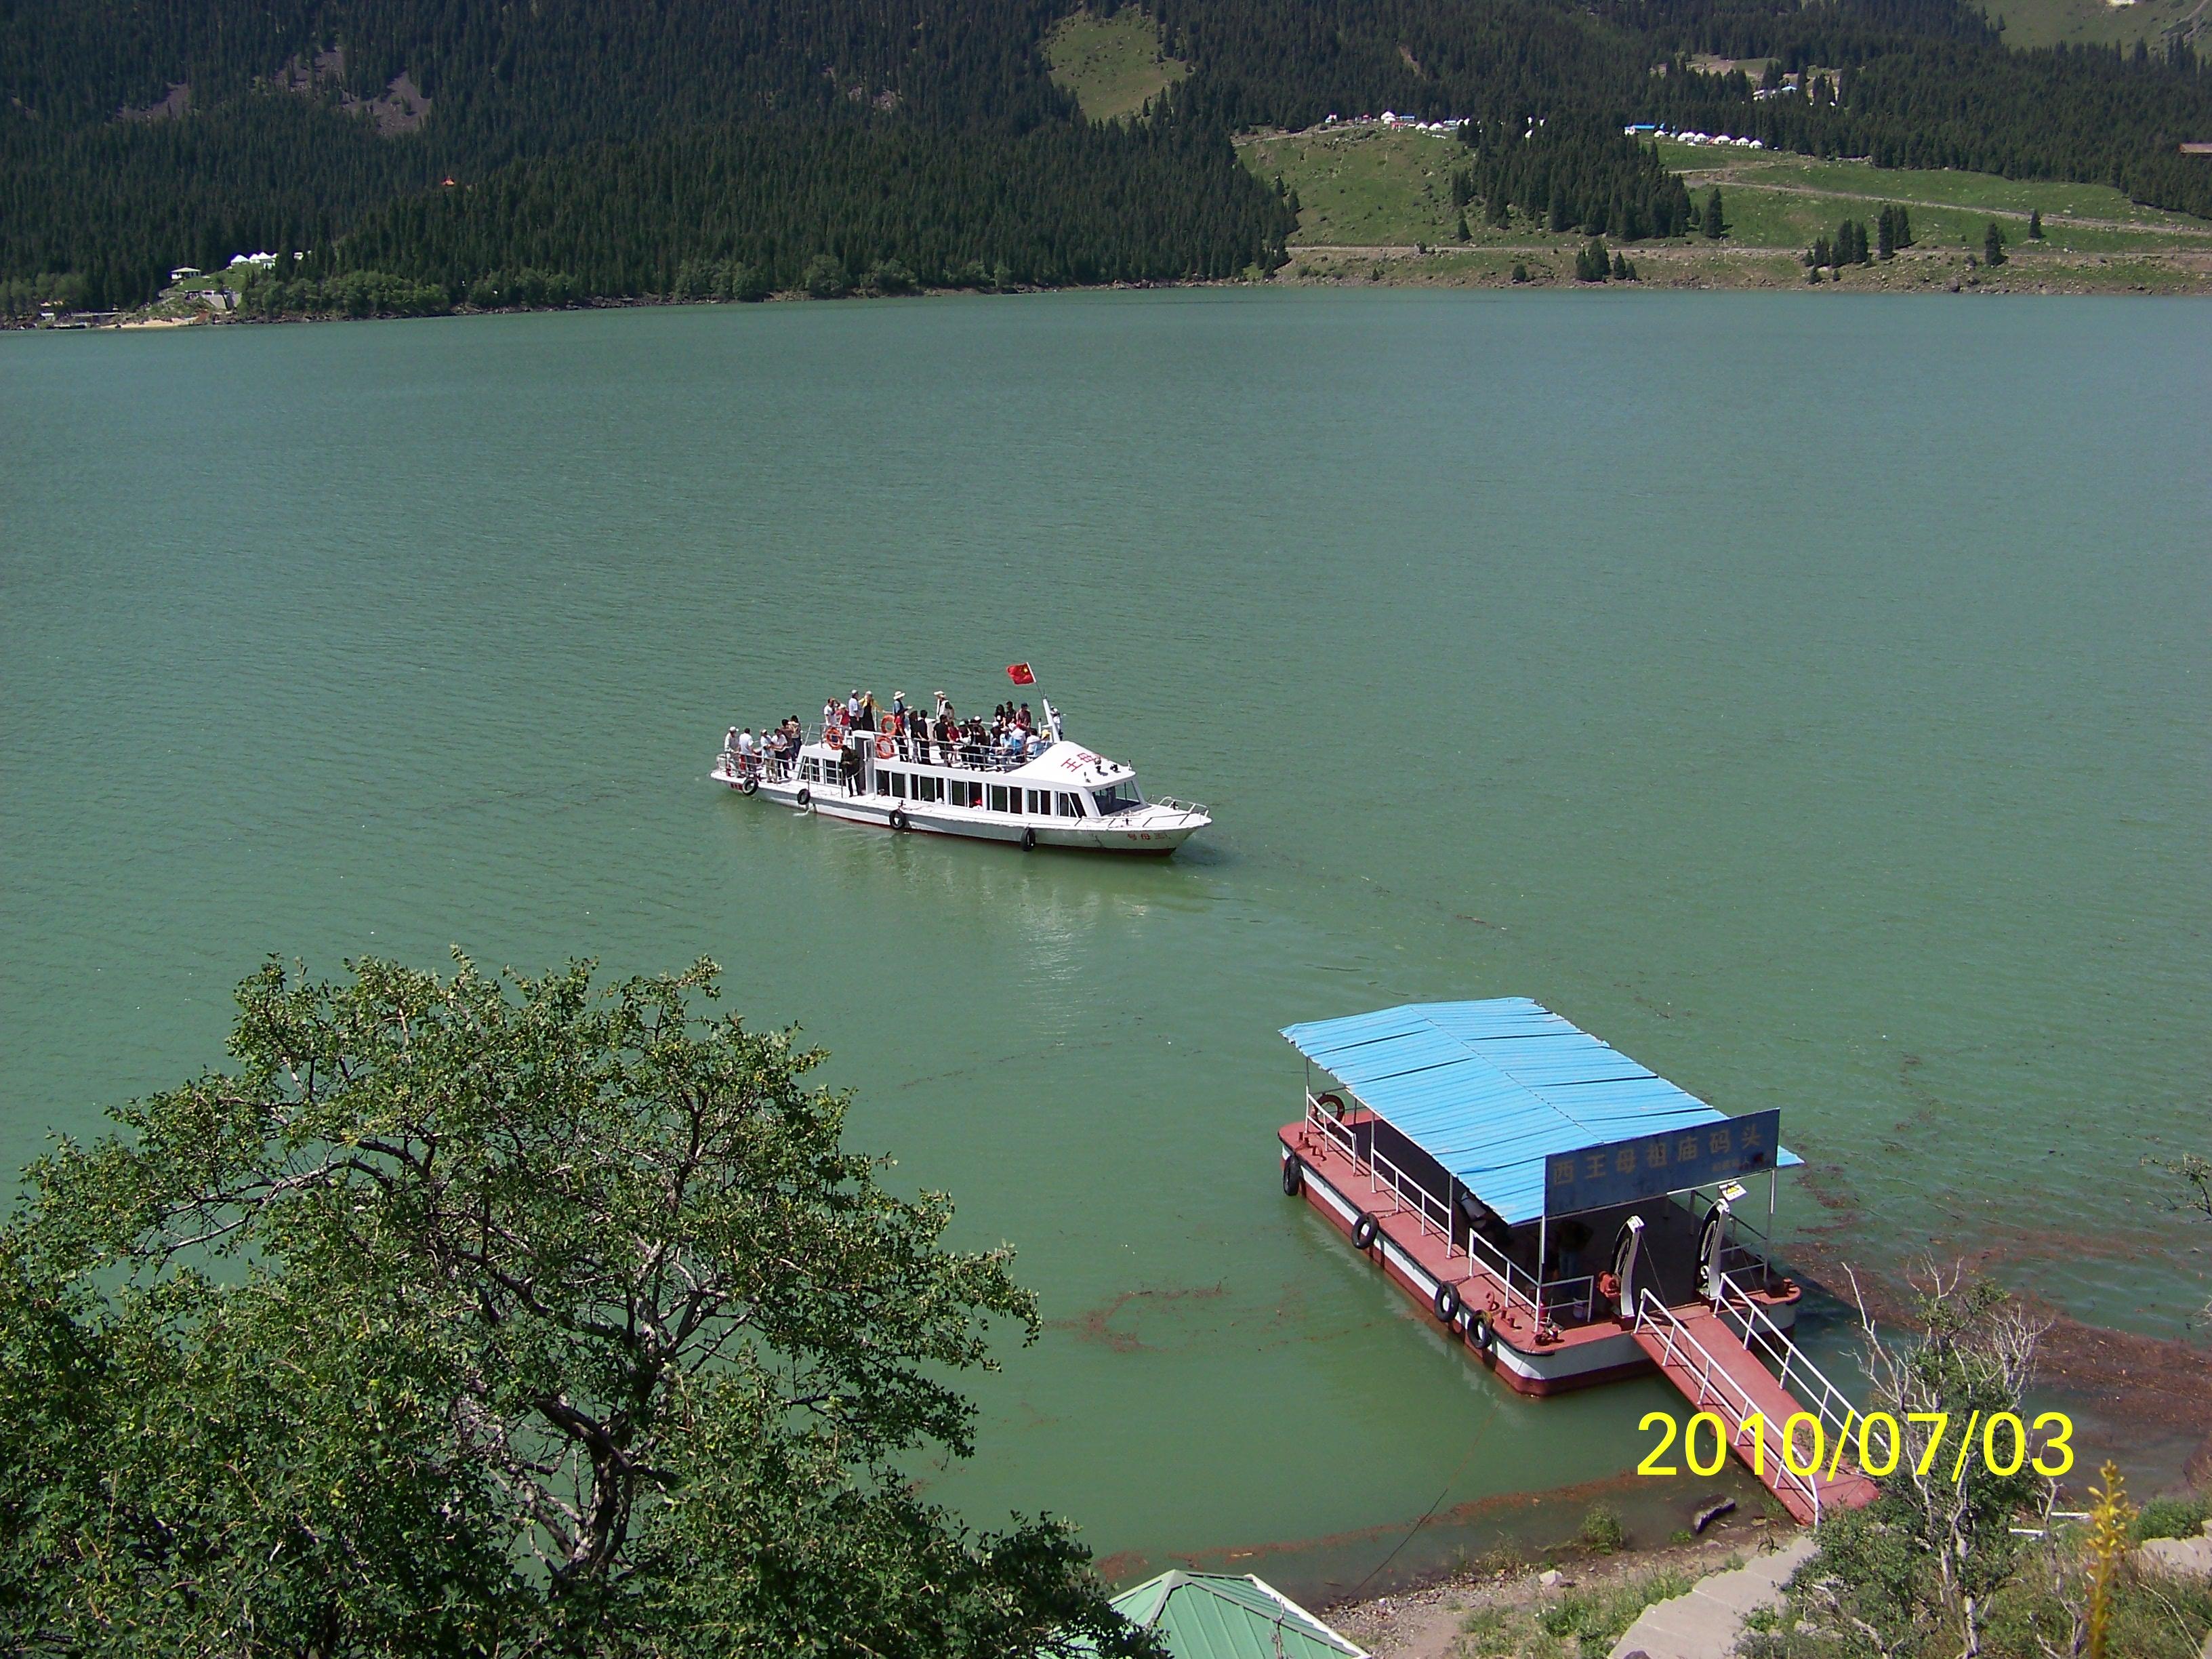 Himmelska sjön - himmelskt vacker